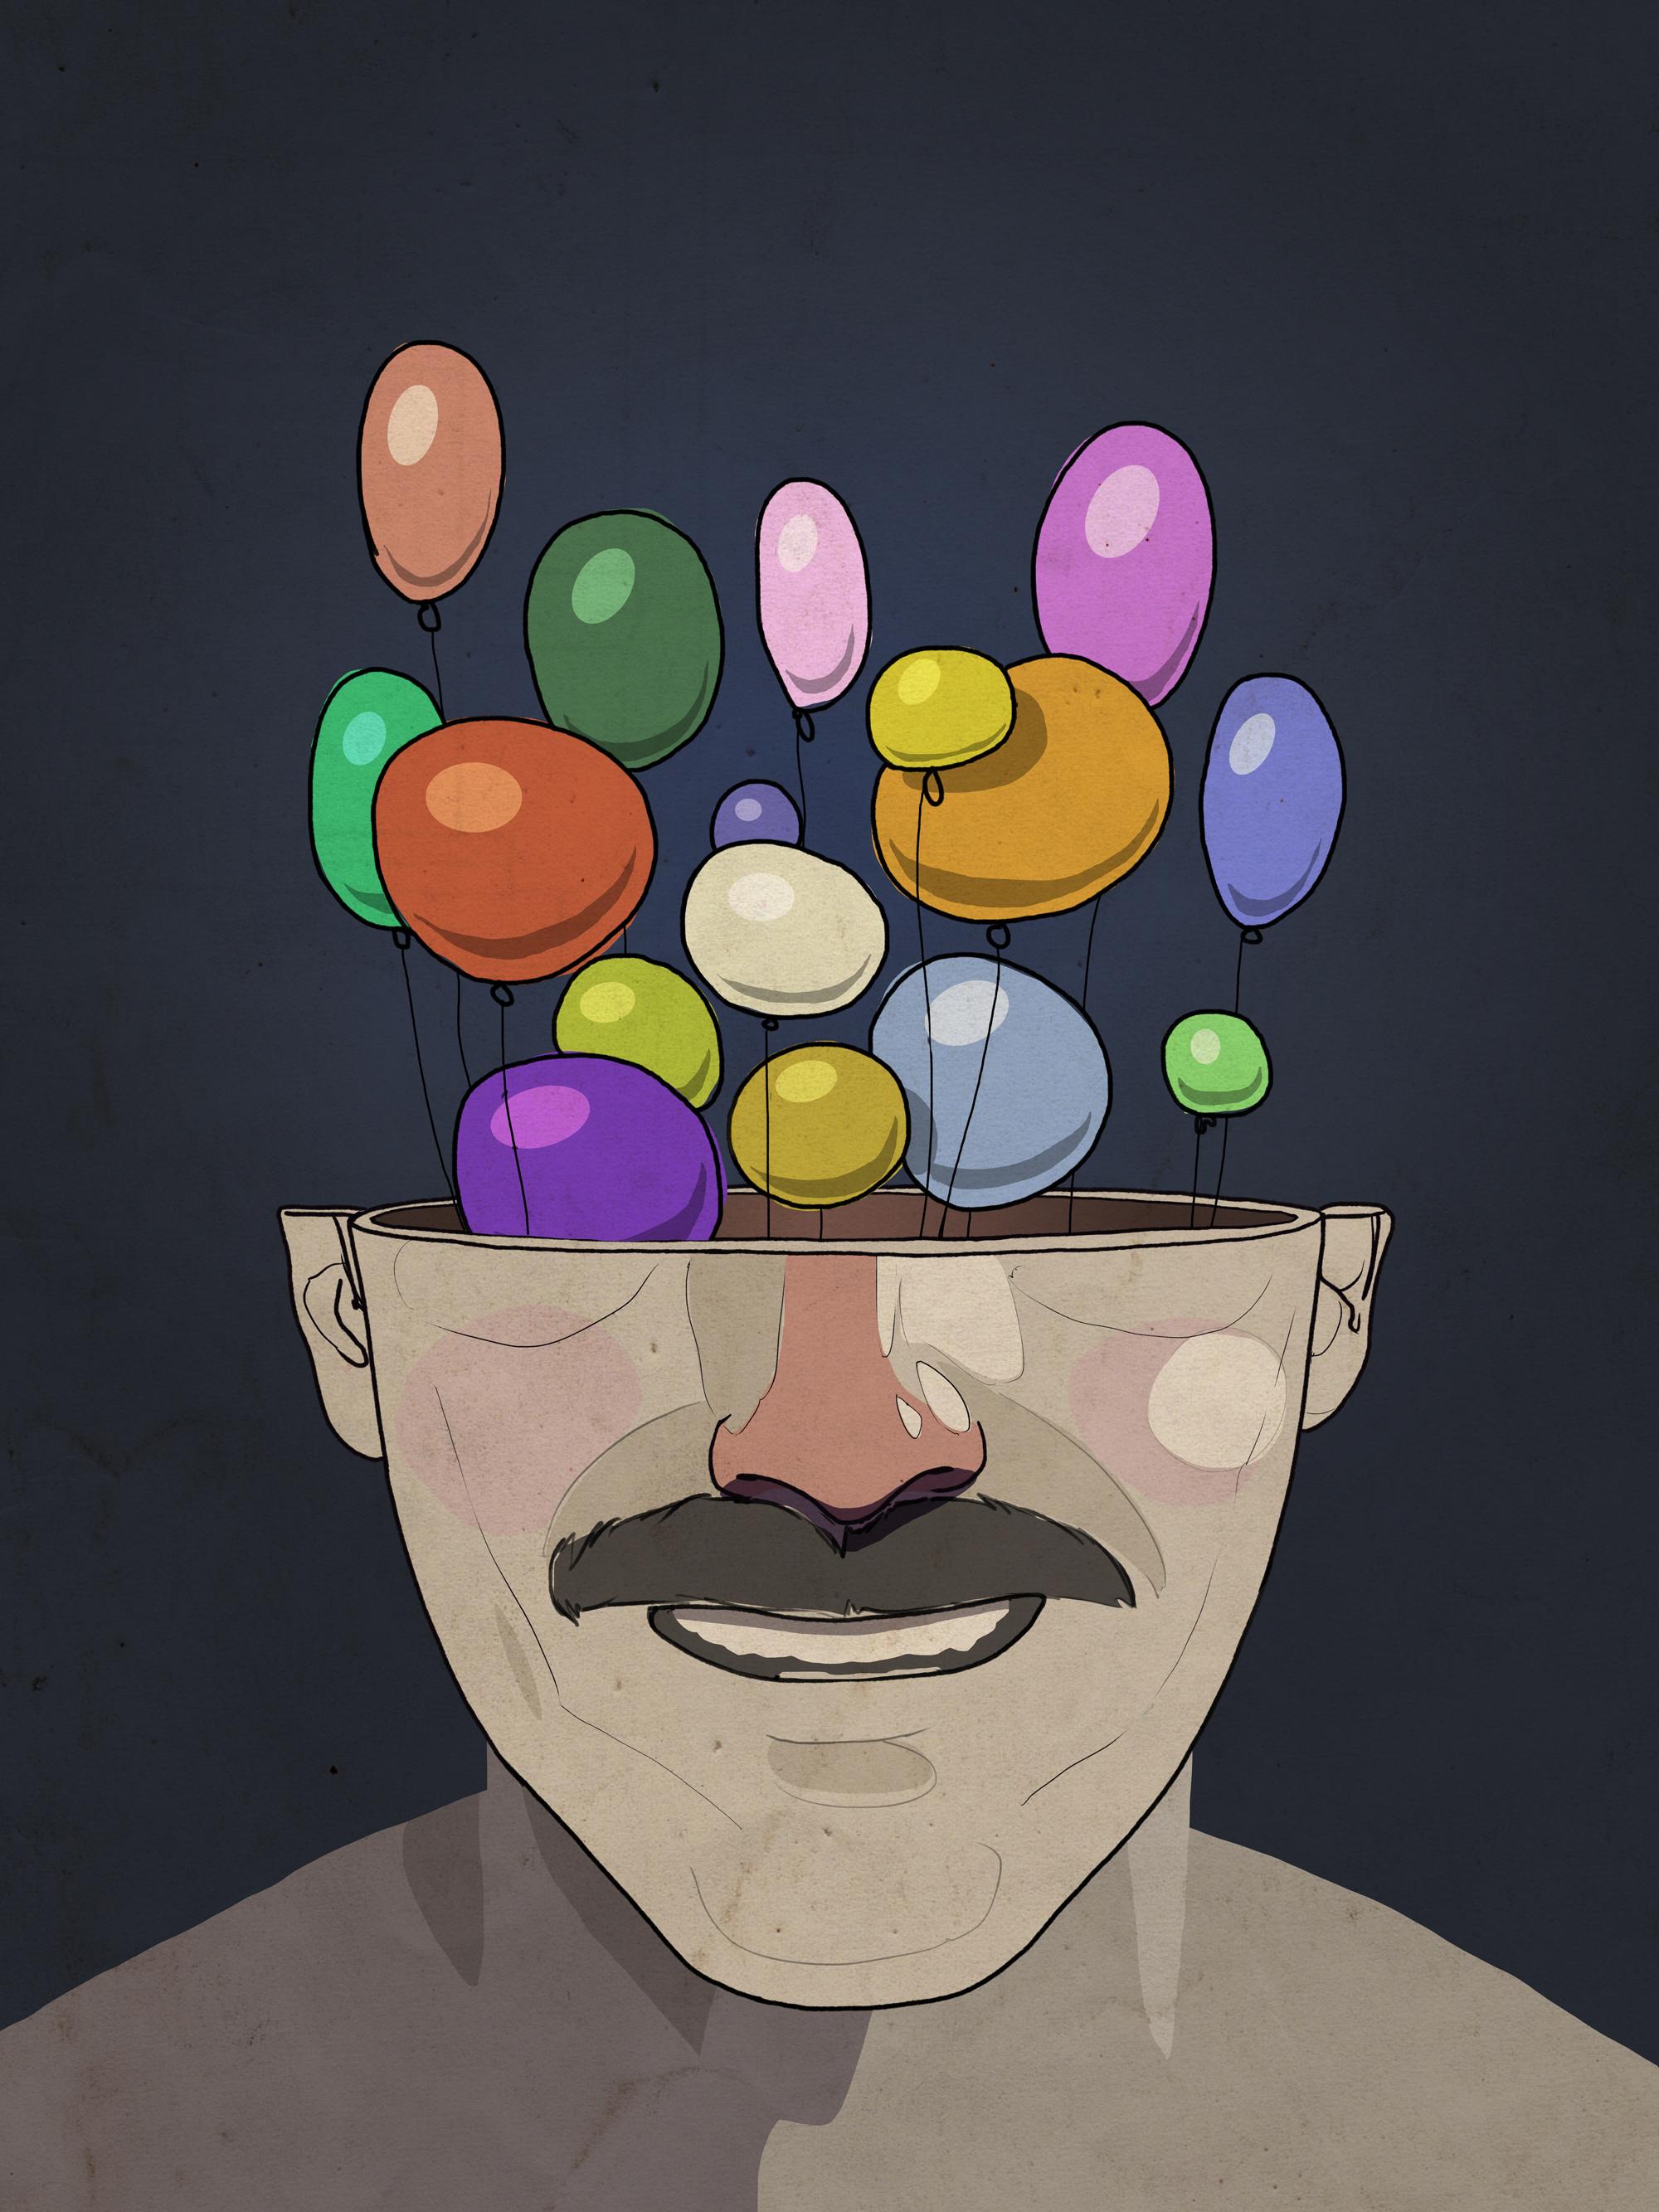 head_balloons_portrait_study_lowres.jpg